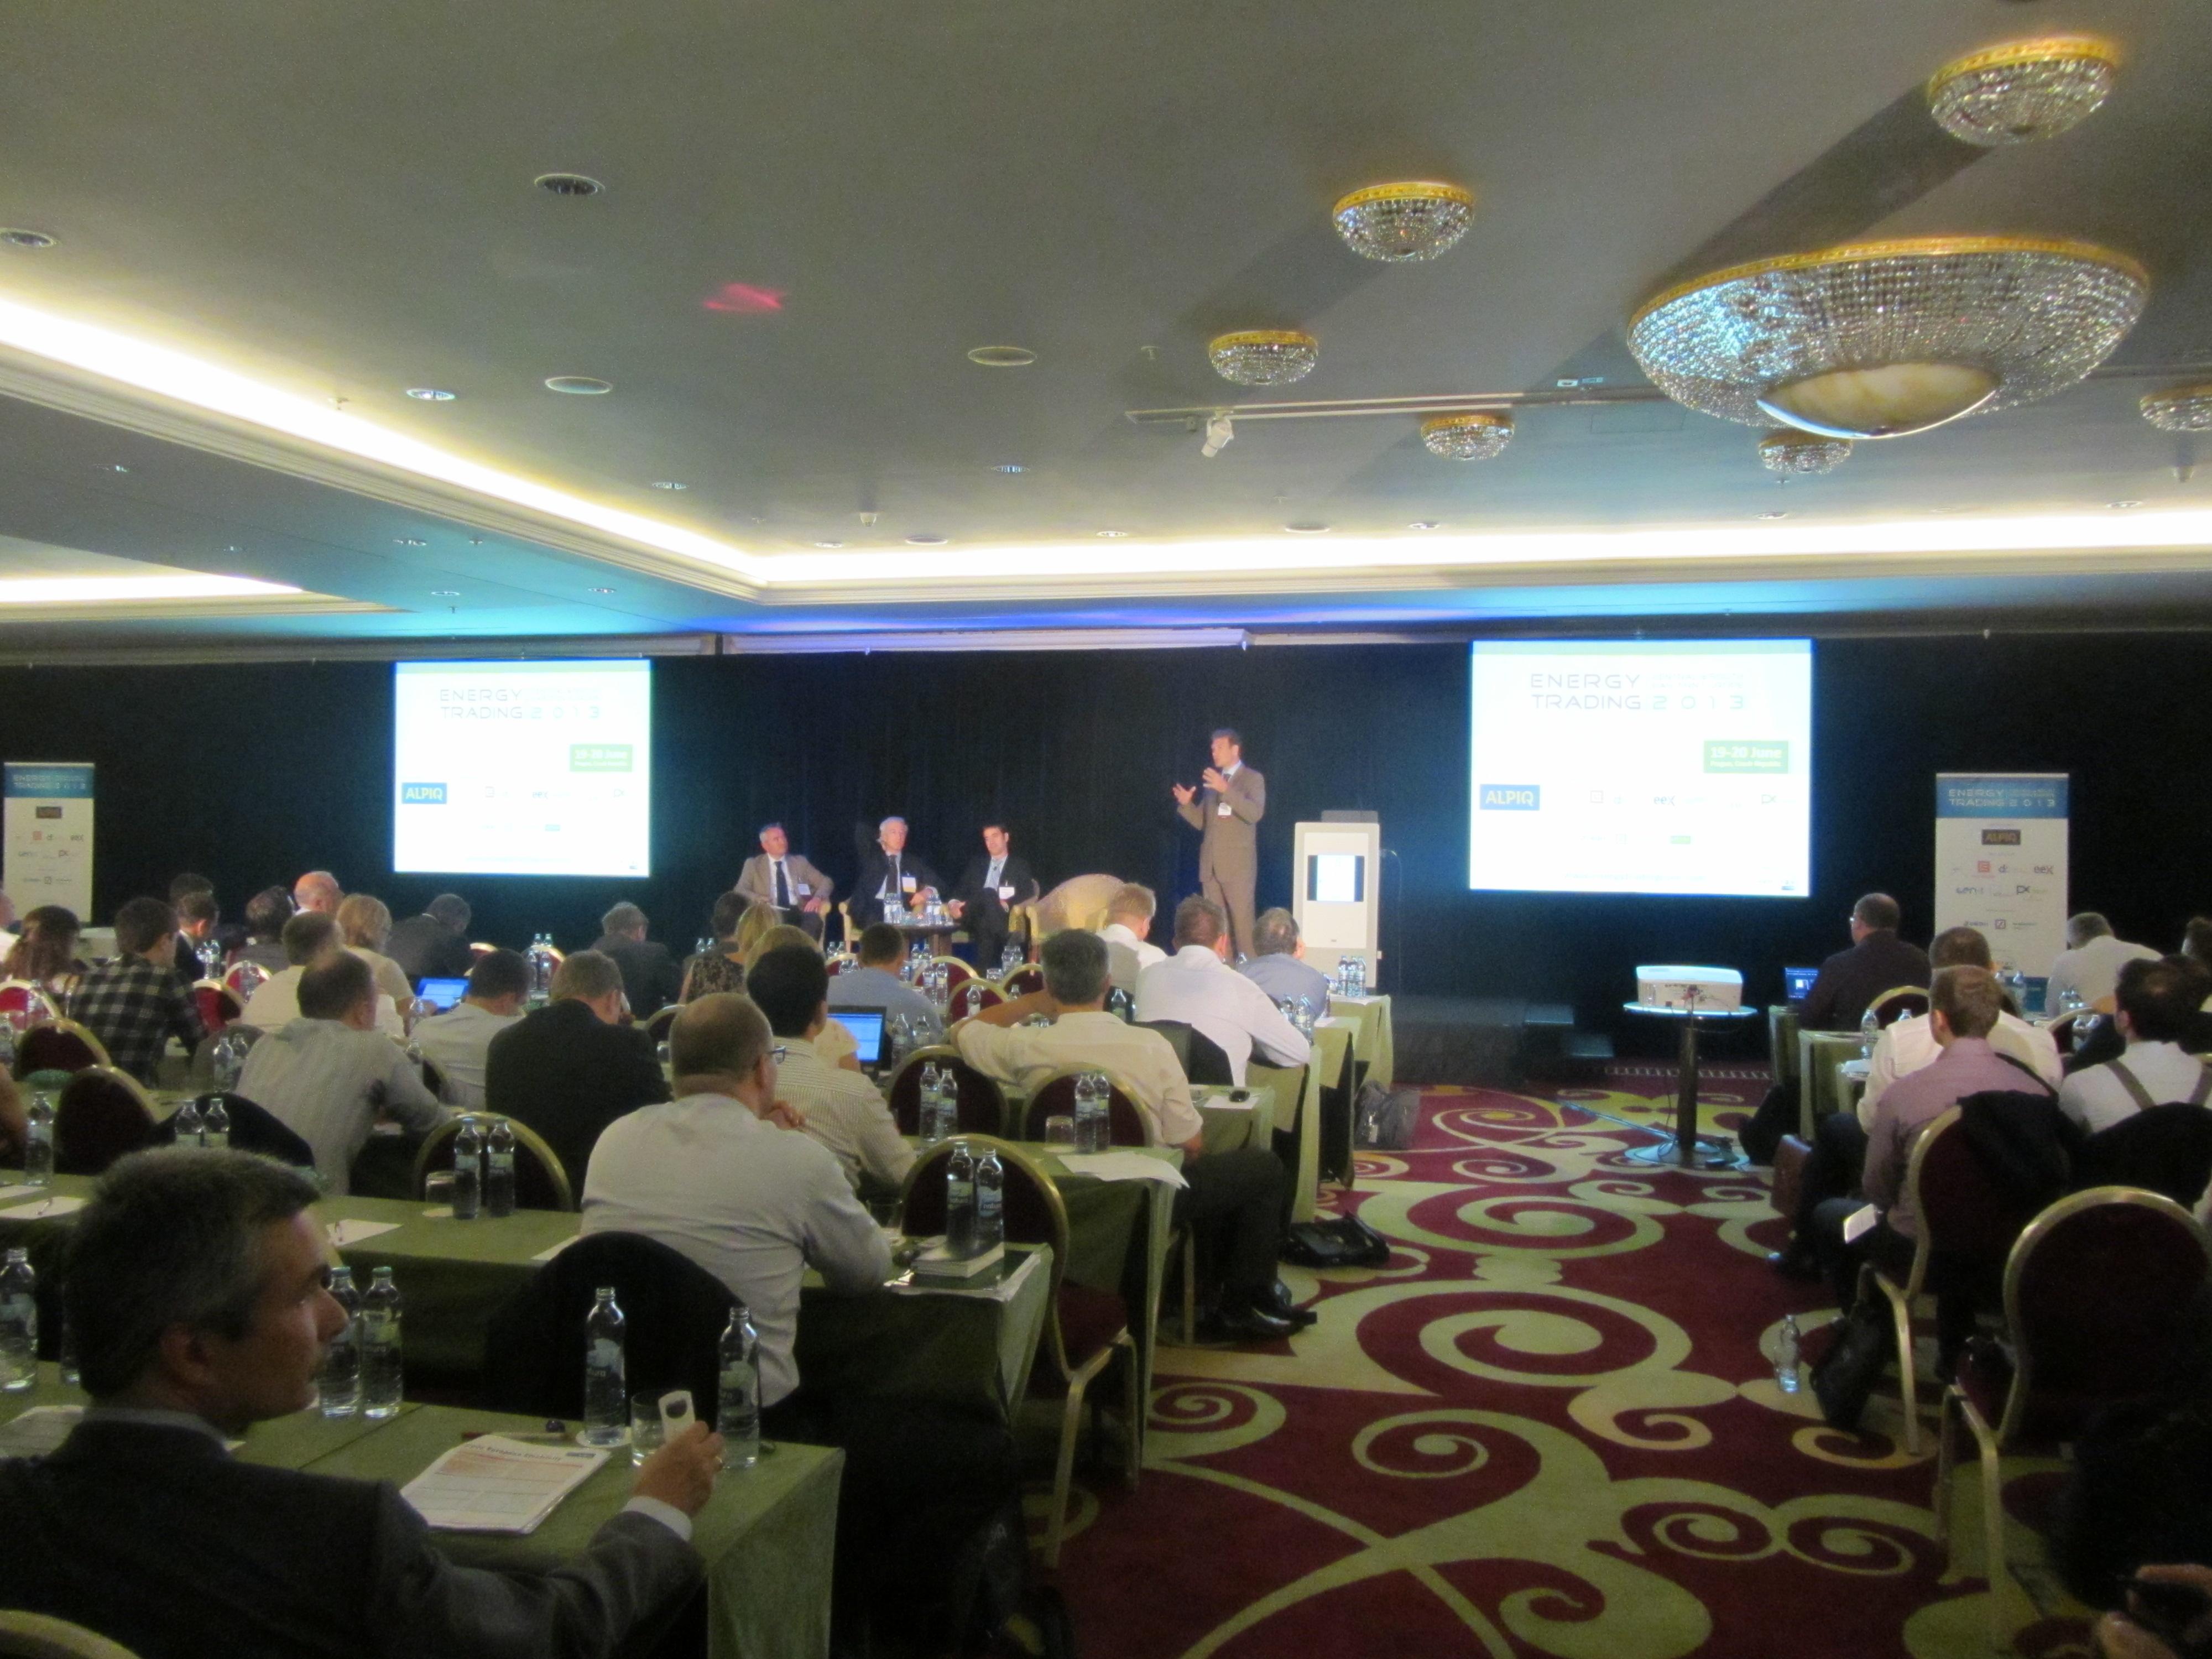 konference_energy_trading_csee_2013